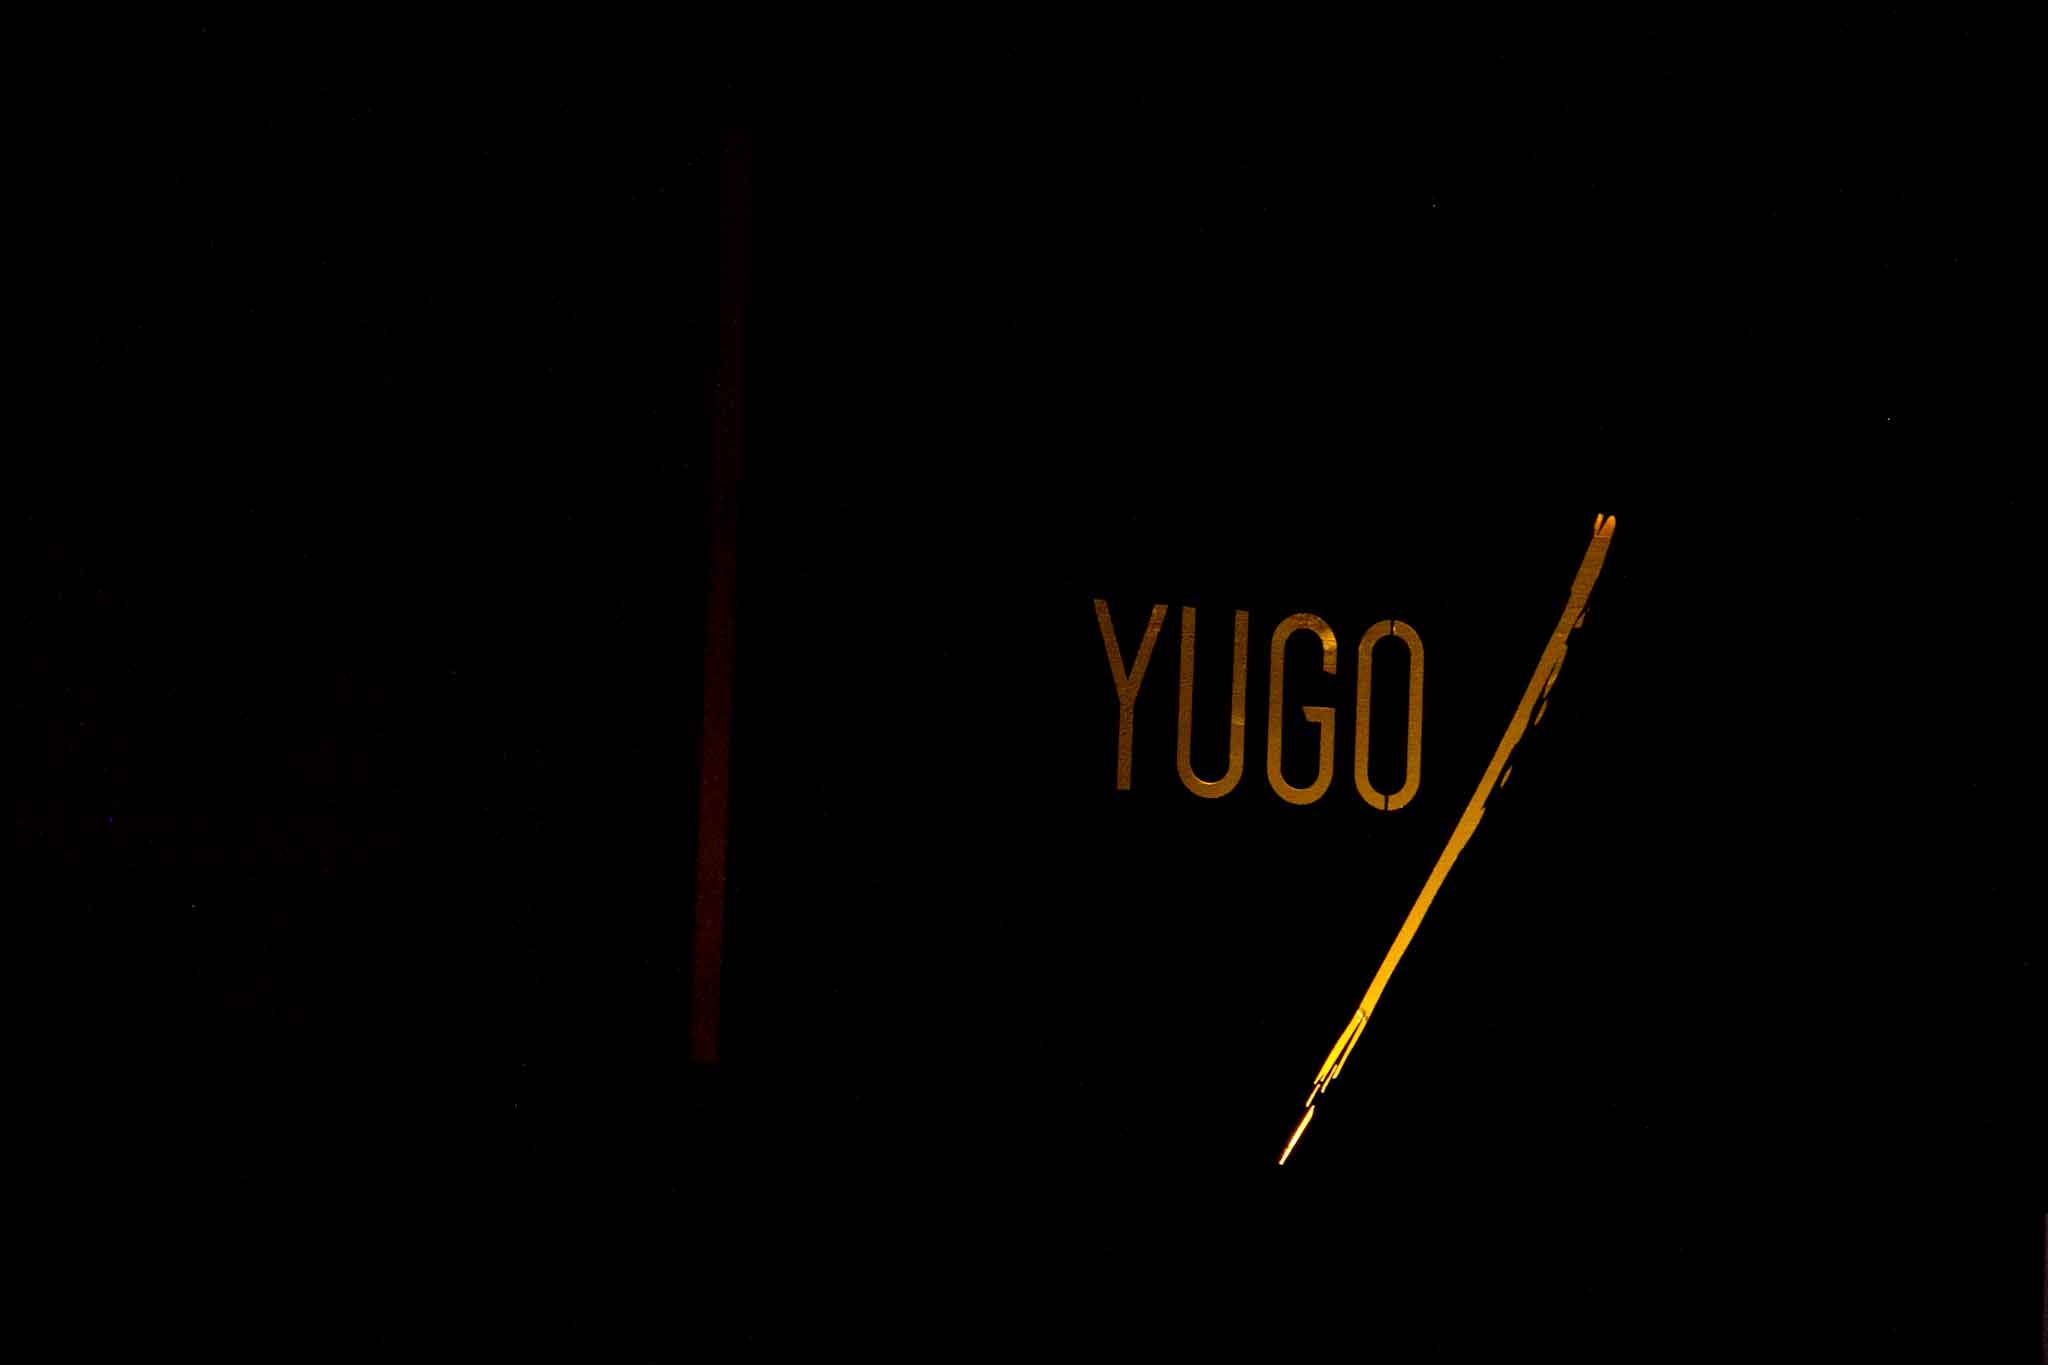 yugo-roma-logo